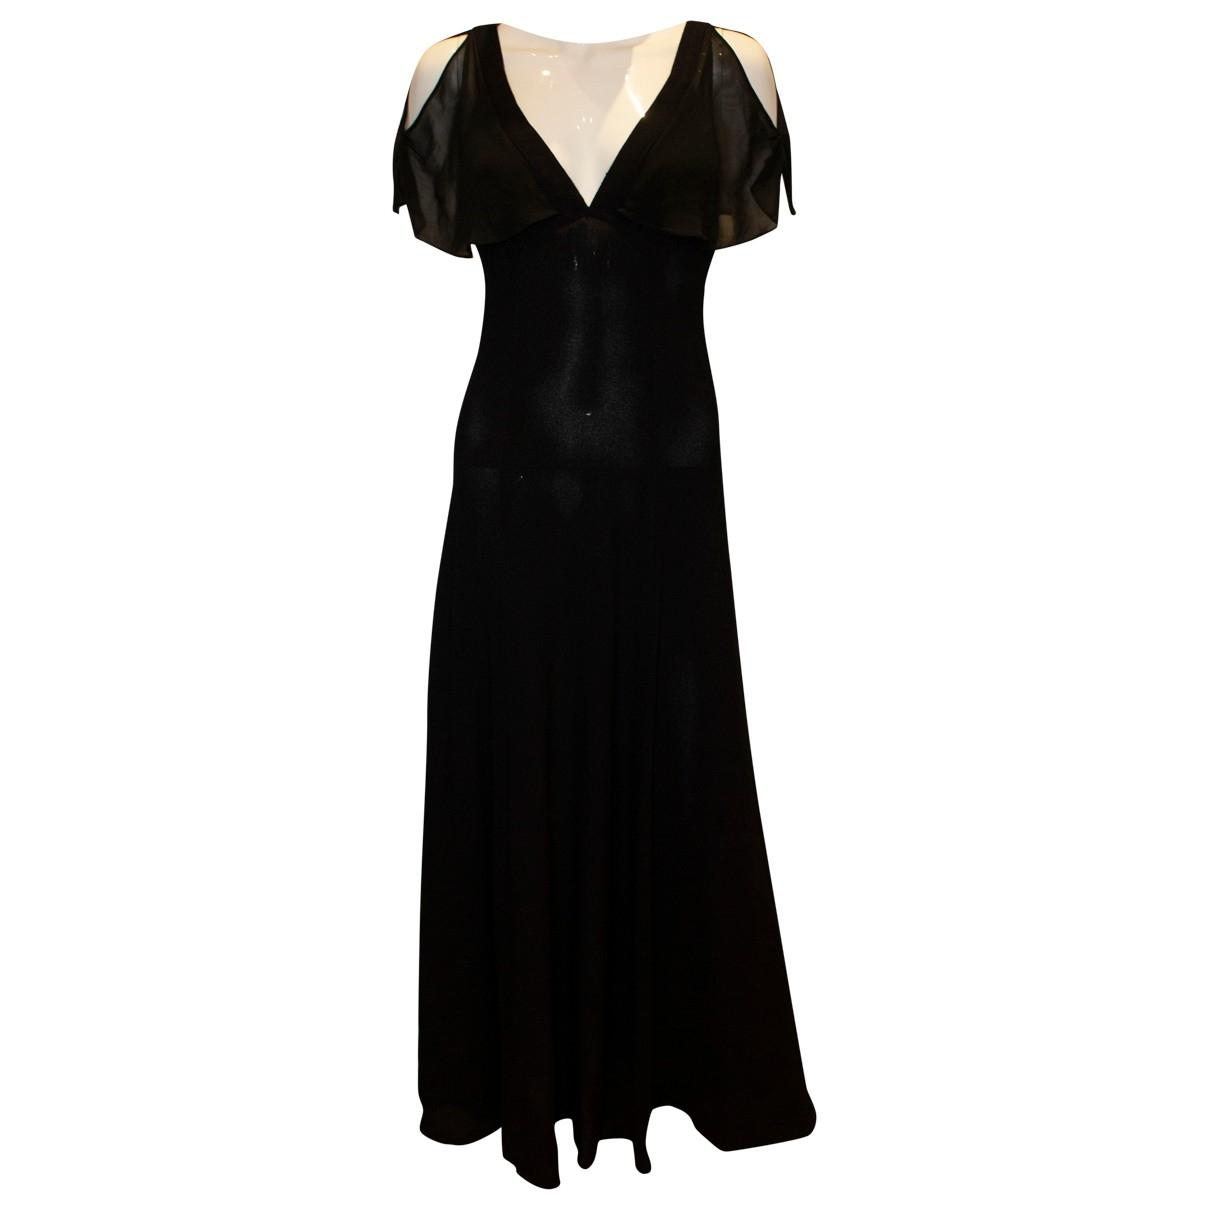 Radley London \N Kleid in  Schwarz Synthetik